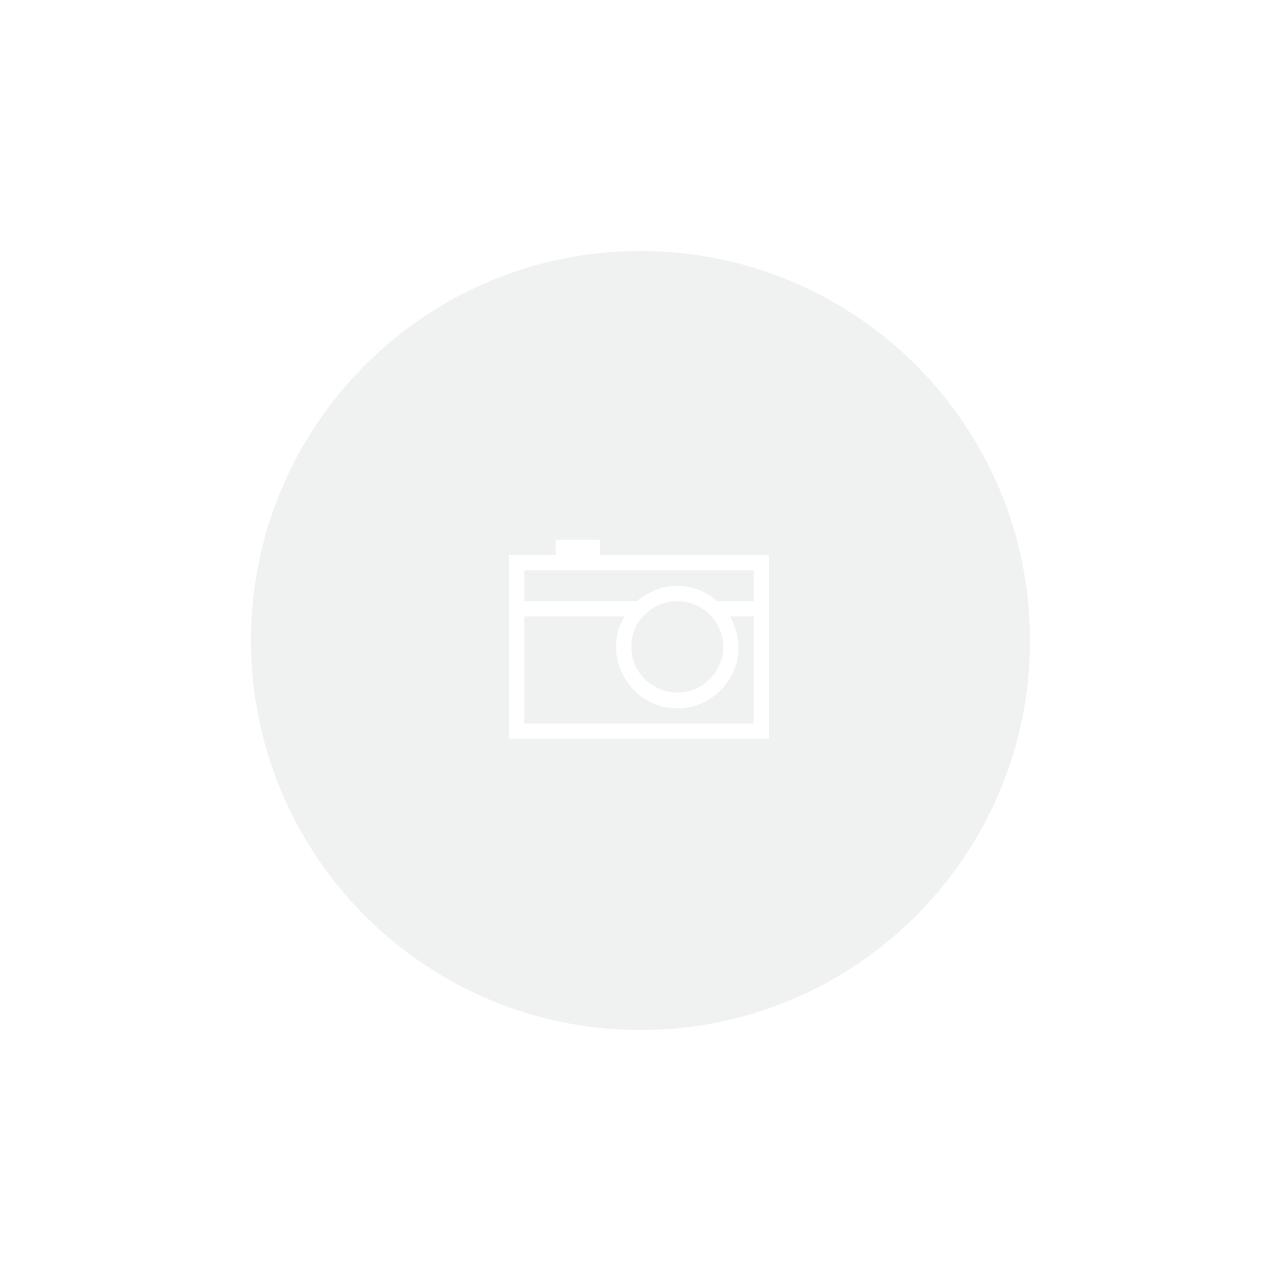 Stickers - Ref. 954D